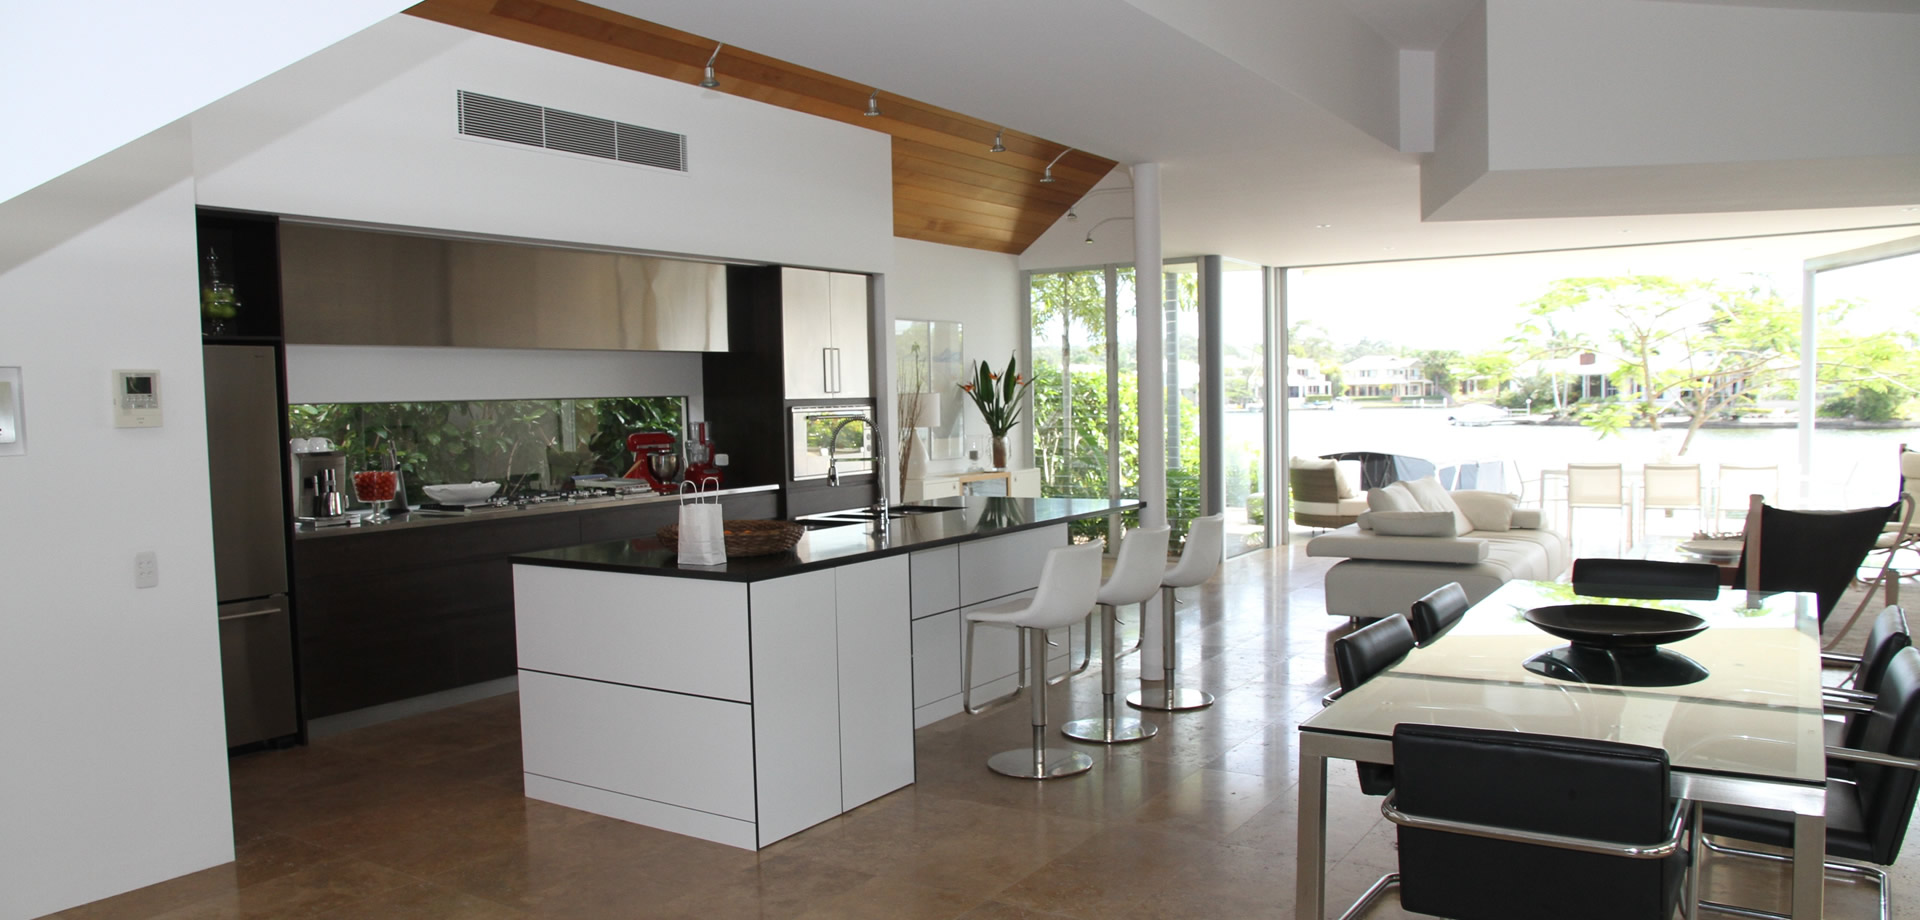 Home Improvement in Marietta